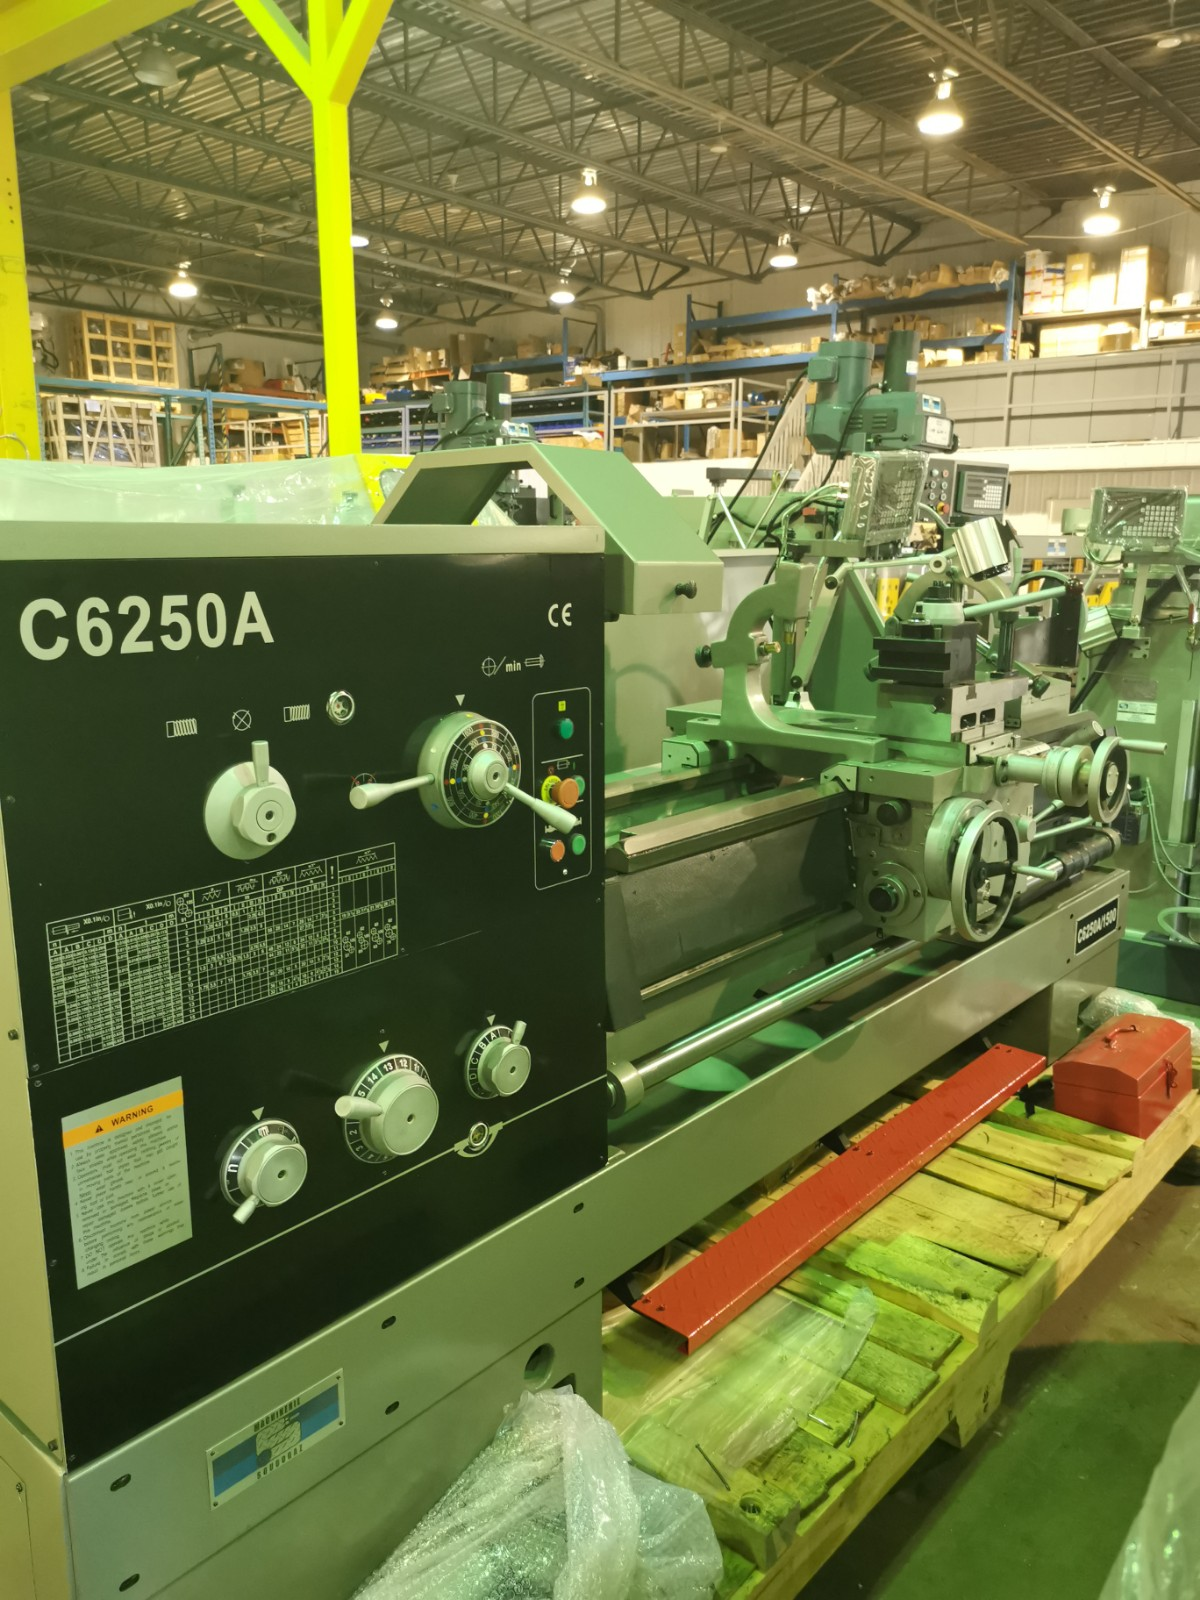 C6250A (20″ X 60″ / 20″ X 80″)